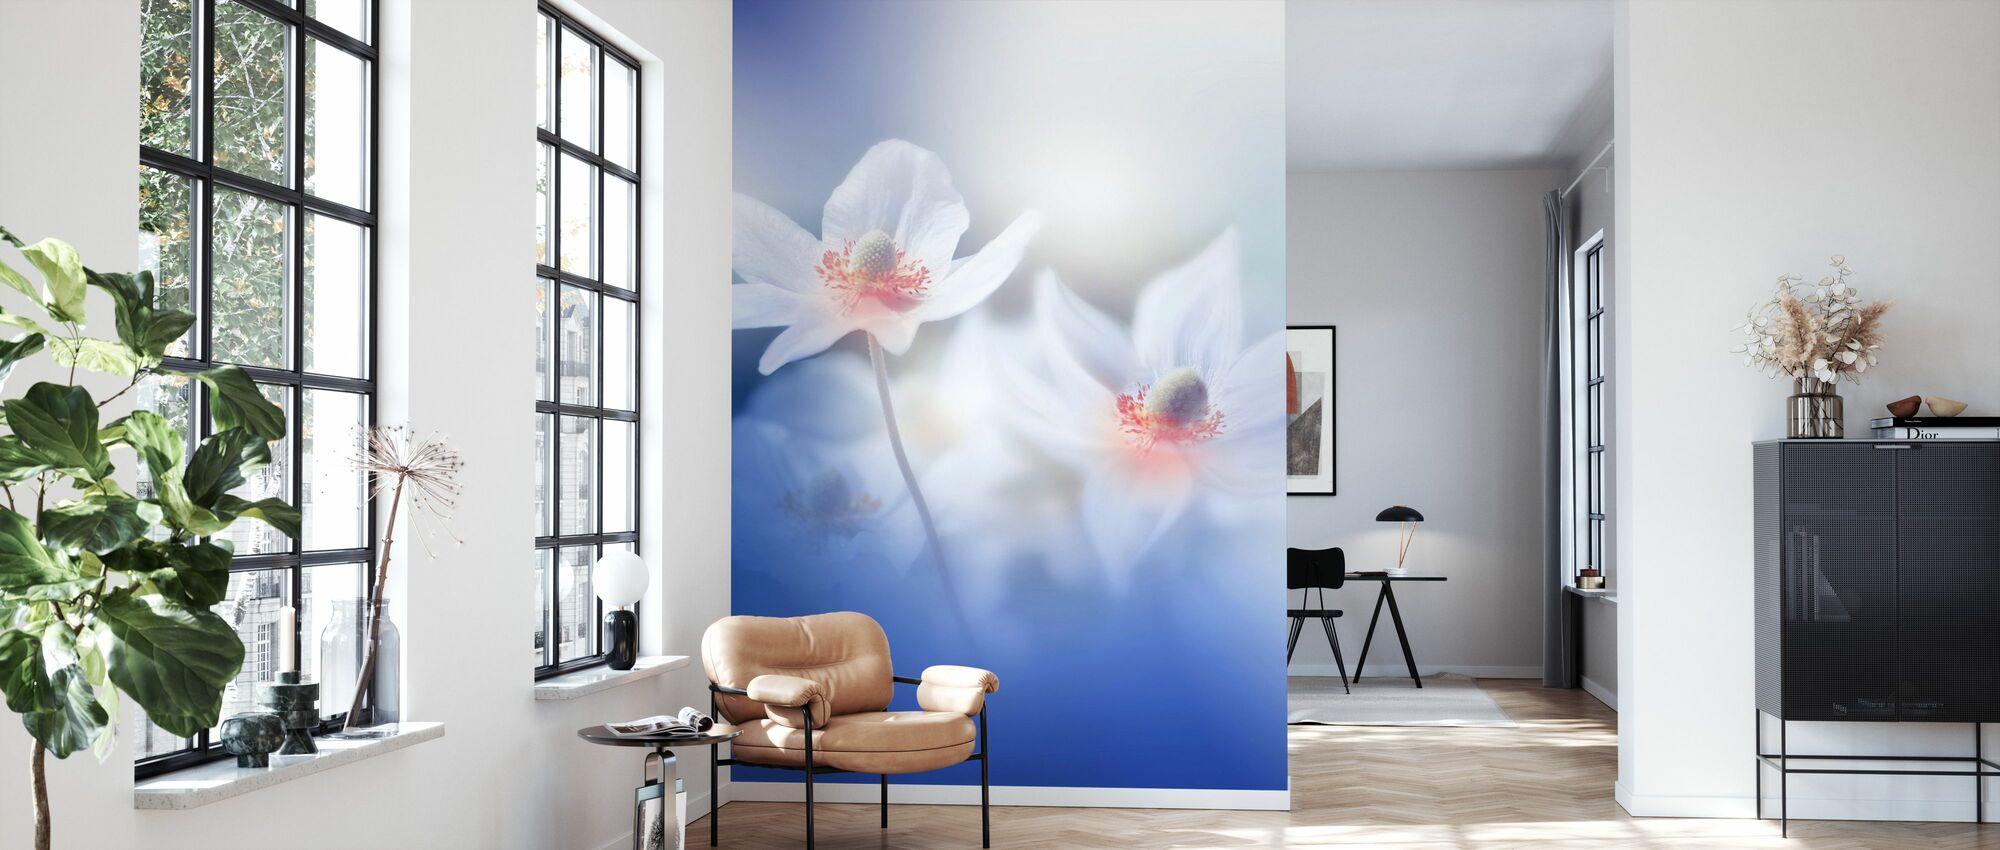 Dancers in My Mind - Wallpaper - Living Room